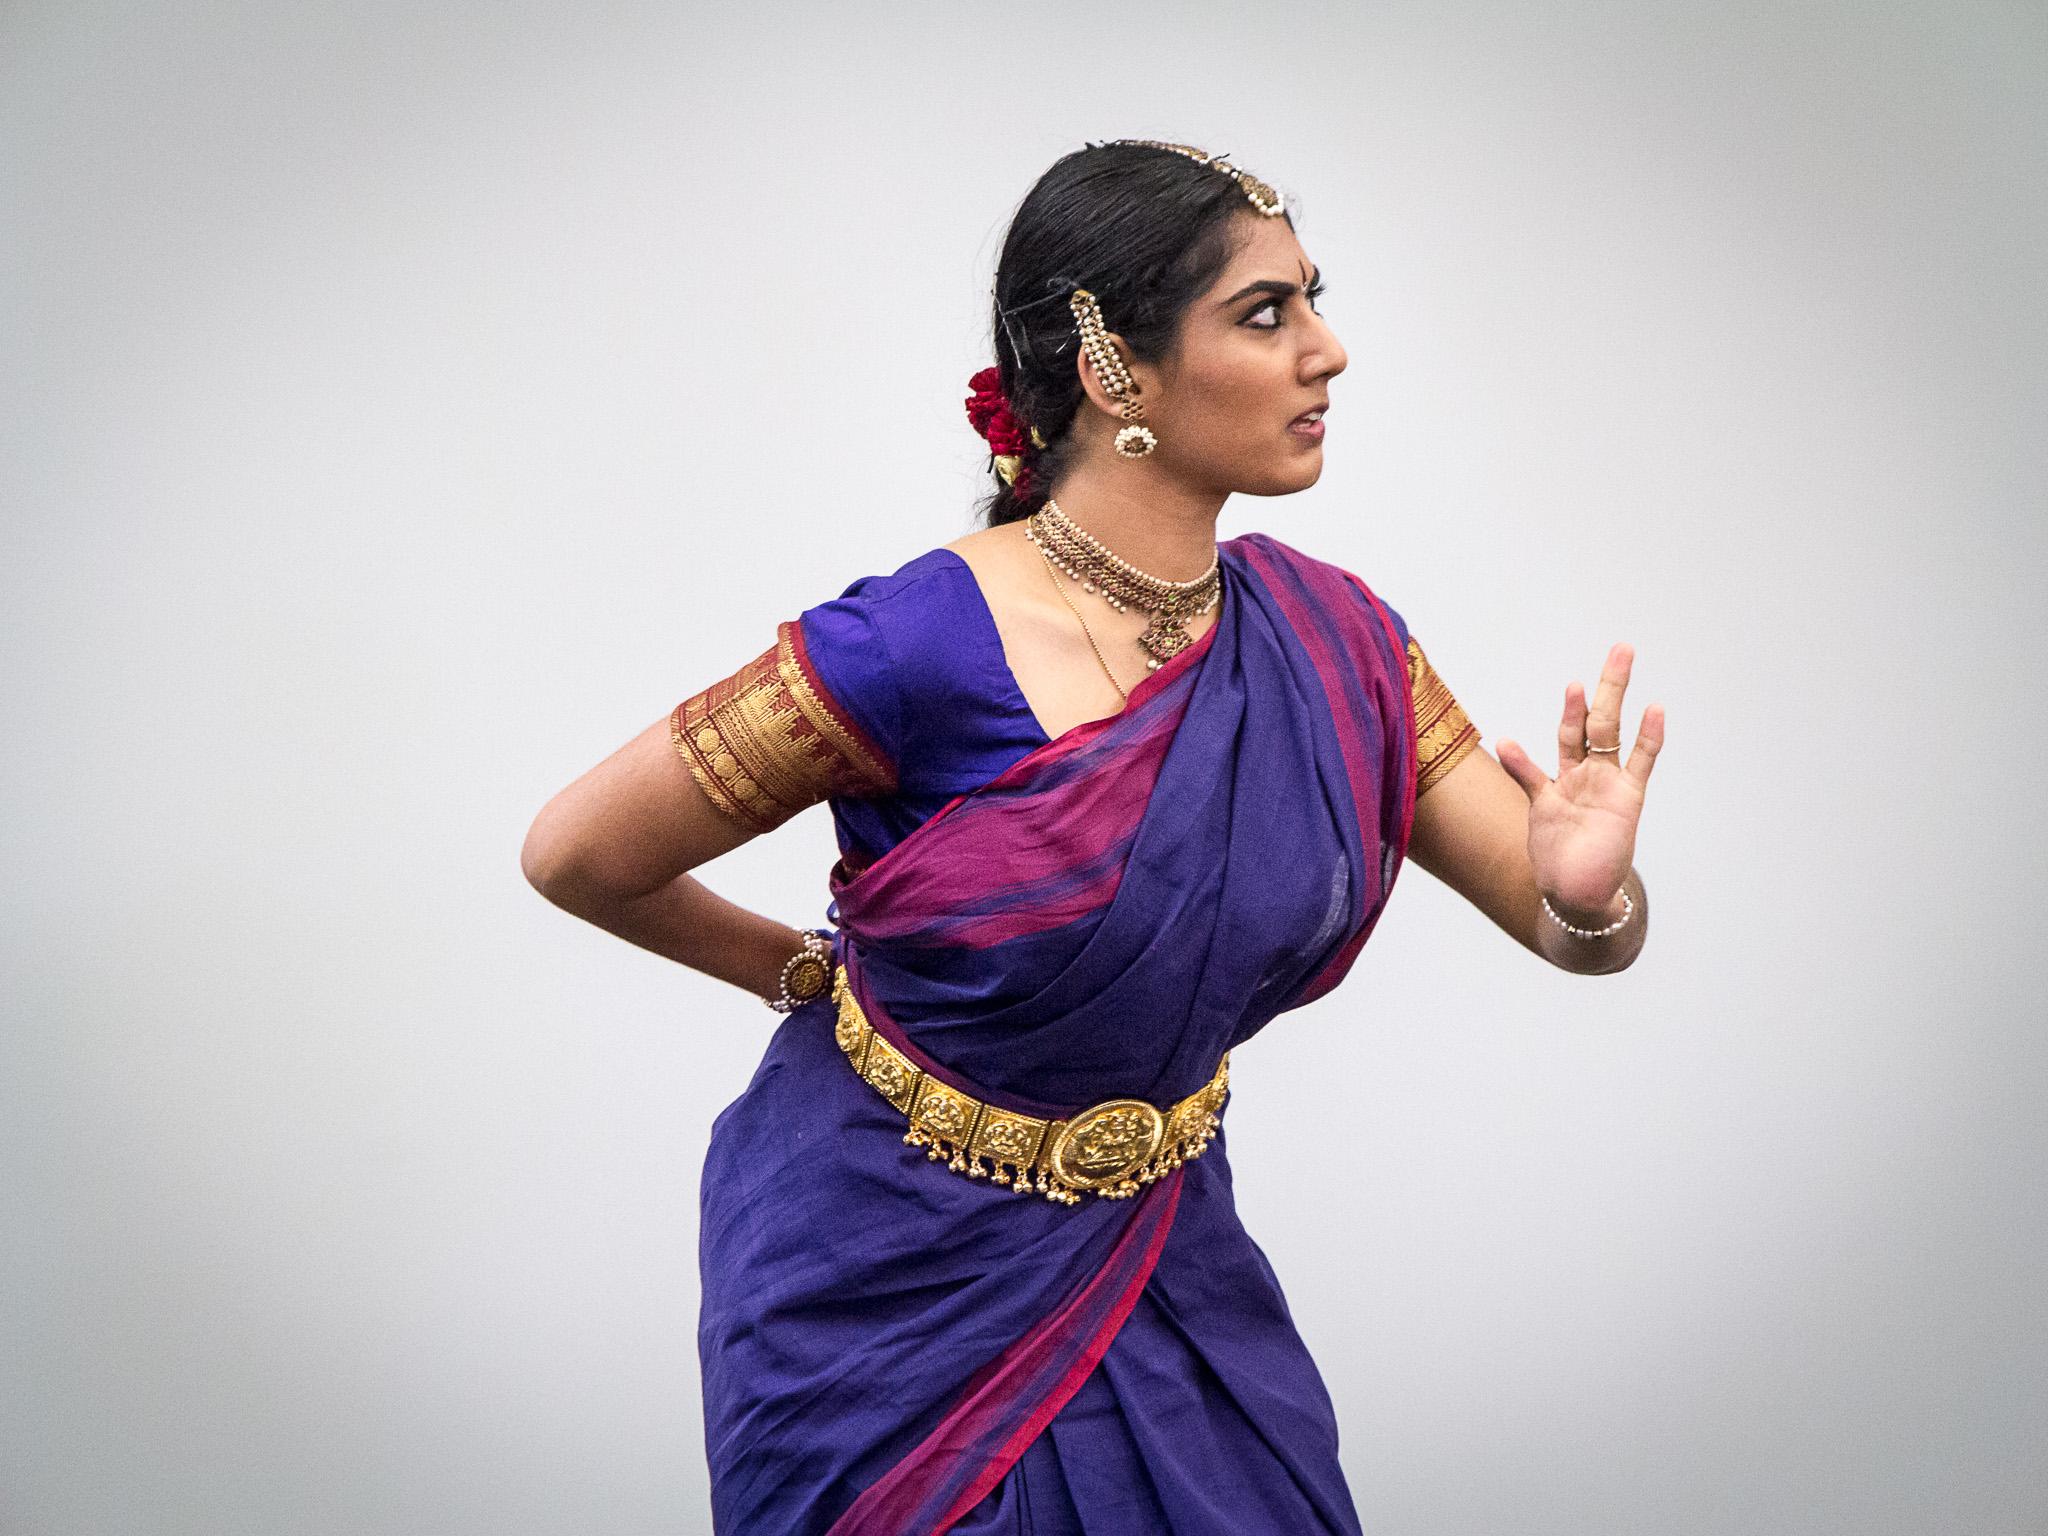 Sutikshna Veeravali's classical dance performance